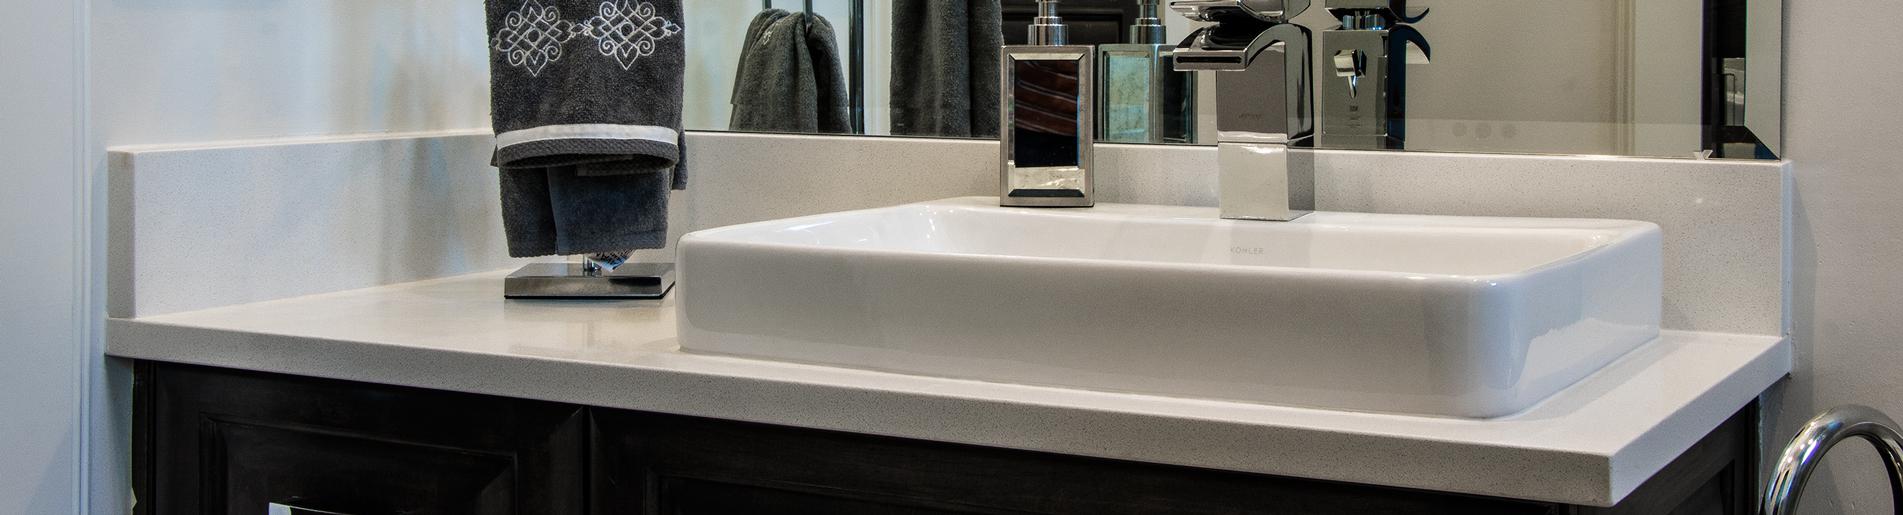 16-sta-granite-bathroom-cambria-c